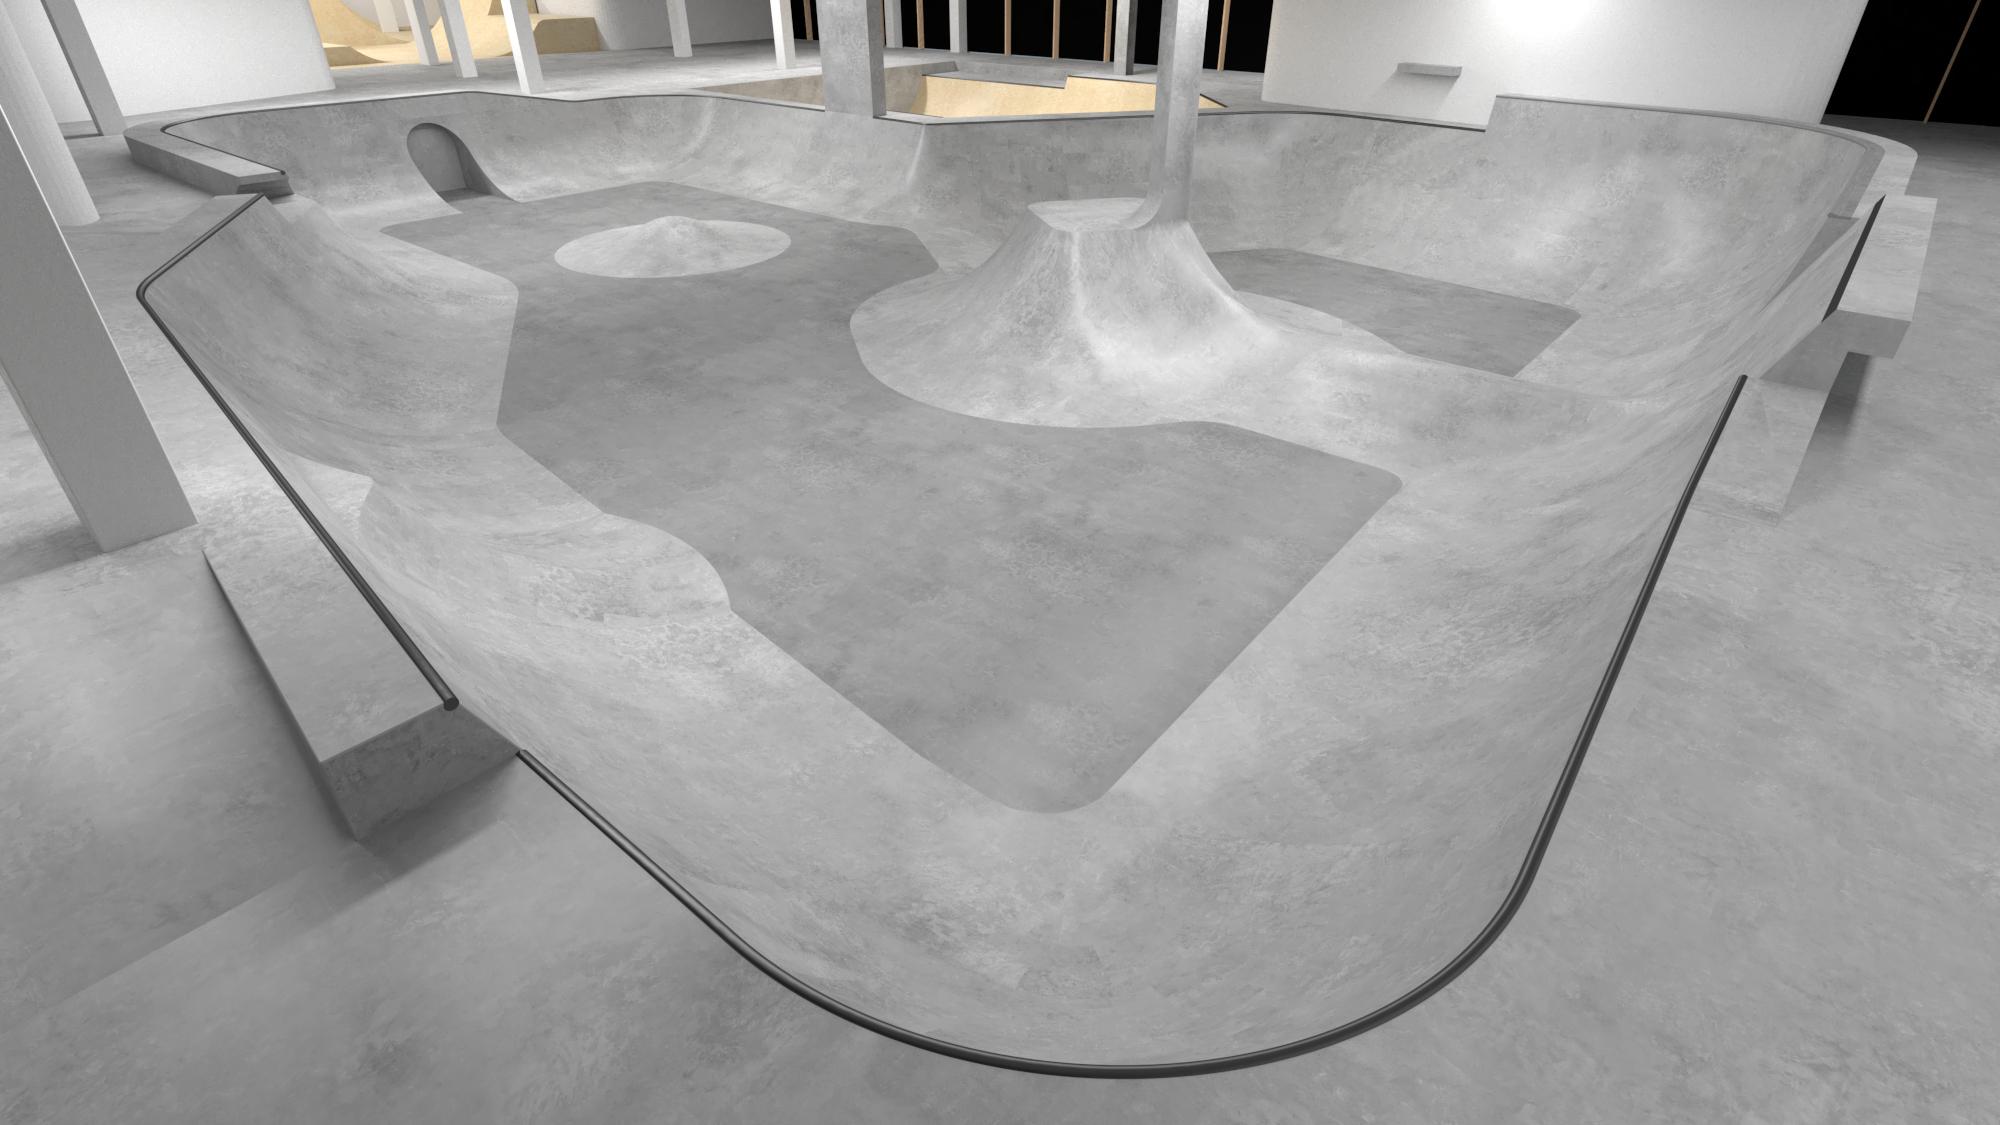 asz-bowl-overview-render-2000×1125-ps